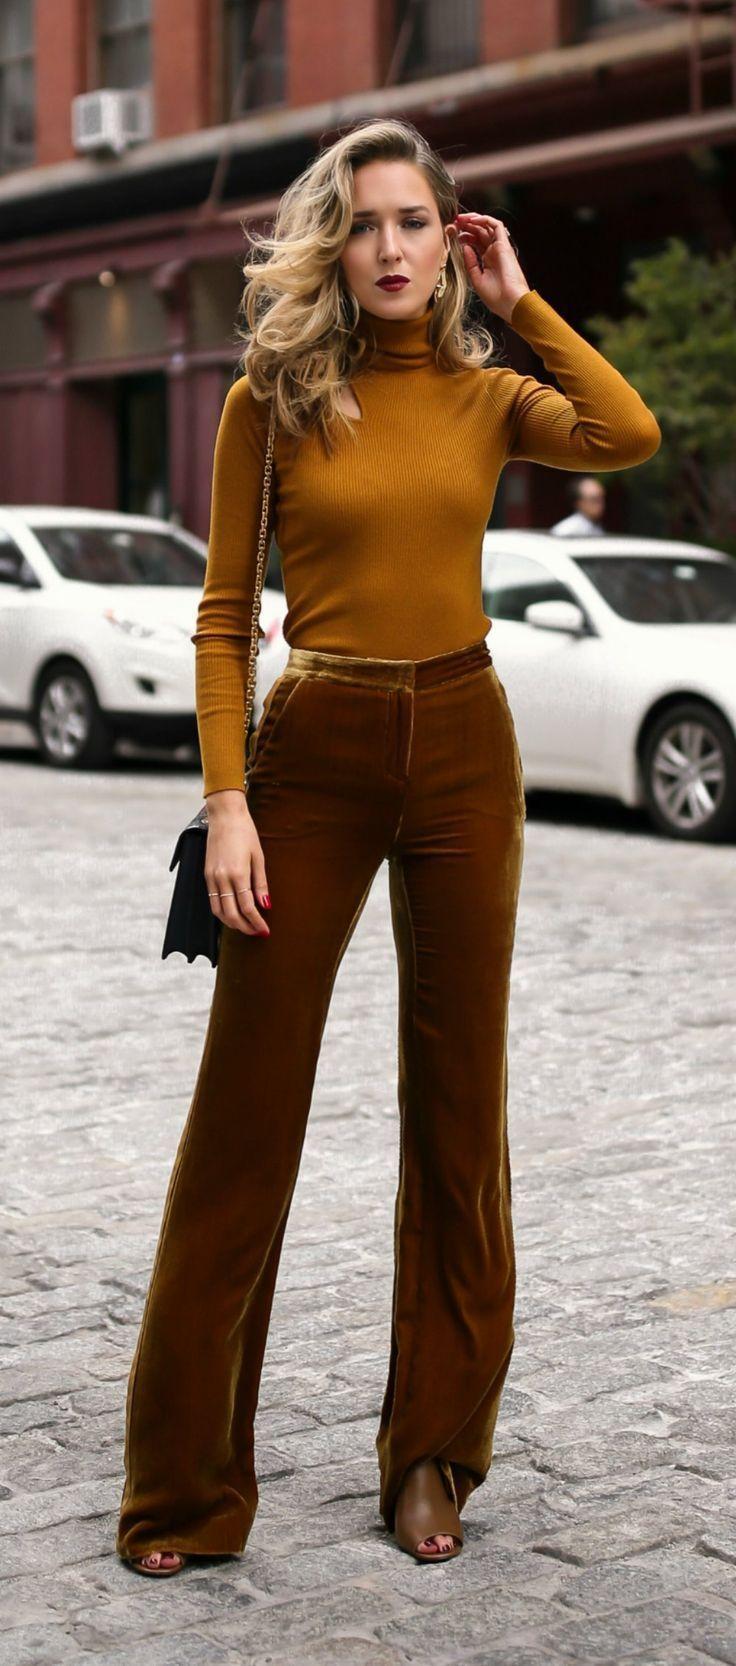 TREND MEMO: Velvet //  Marigold cut out long sleeve turtleneck, velvet gold tuxedo striped wide leg trousers, multi jewel toned handbag and sculptural gold earrings {ALC, Tory Burch, Veronica Beard, Amber Sceats, fall winter 2017 trends, fall trends, classic style, velvet, marigold}